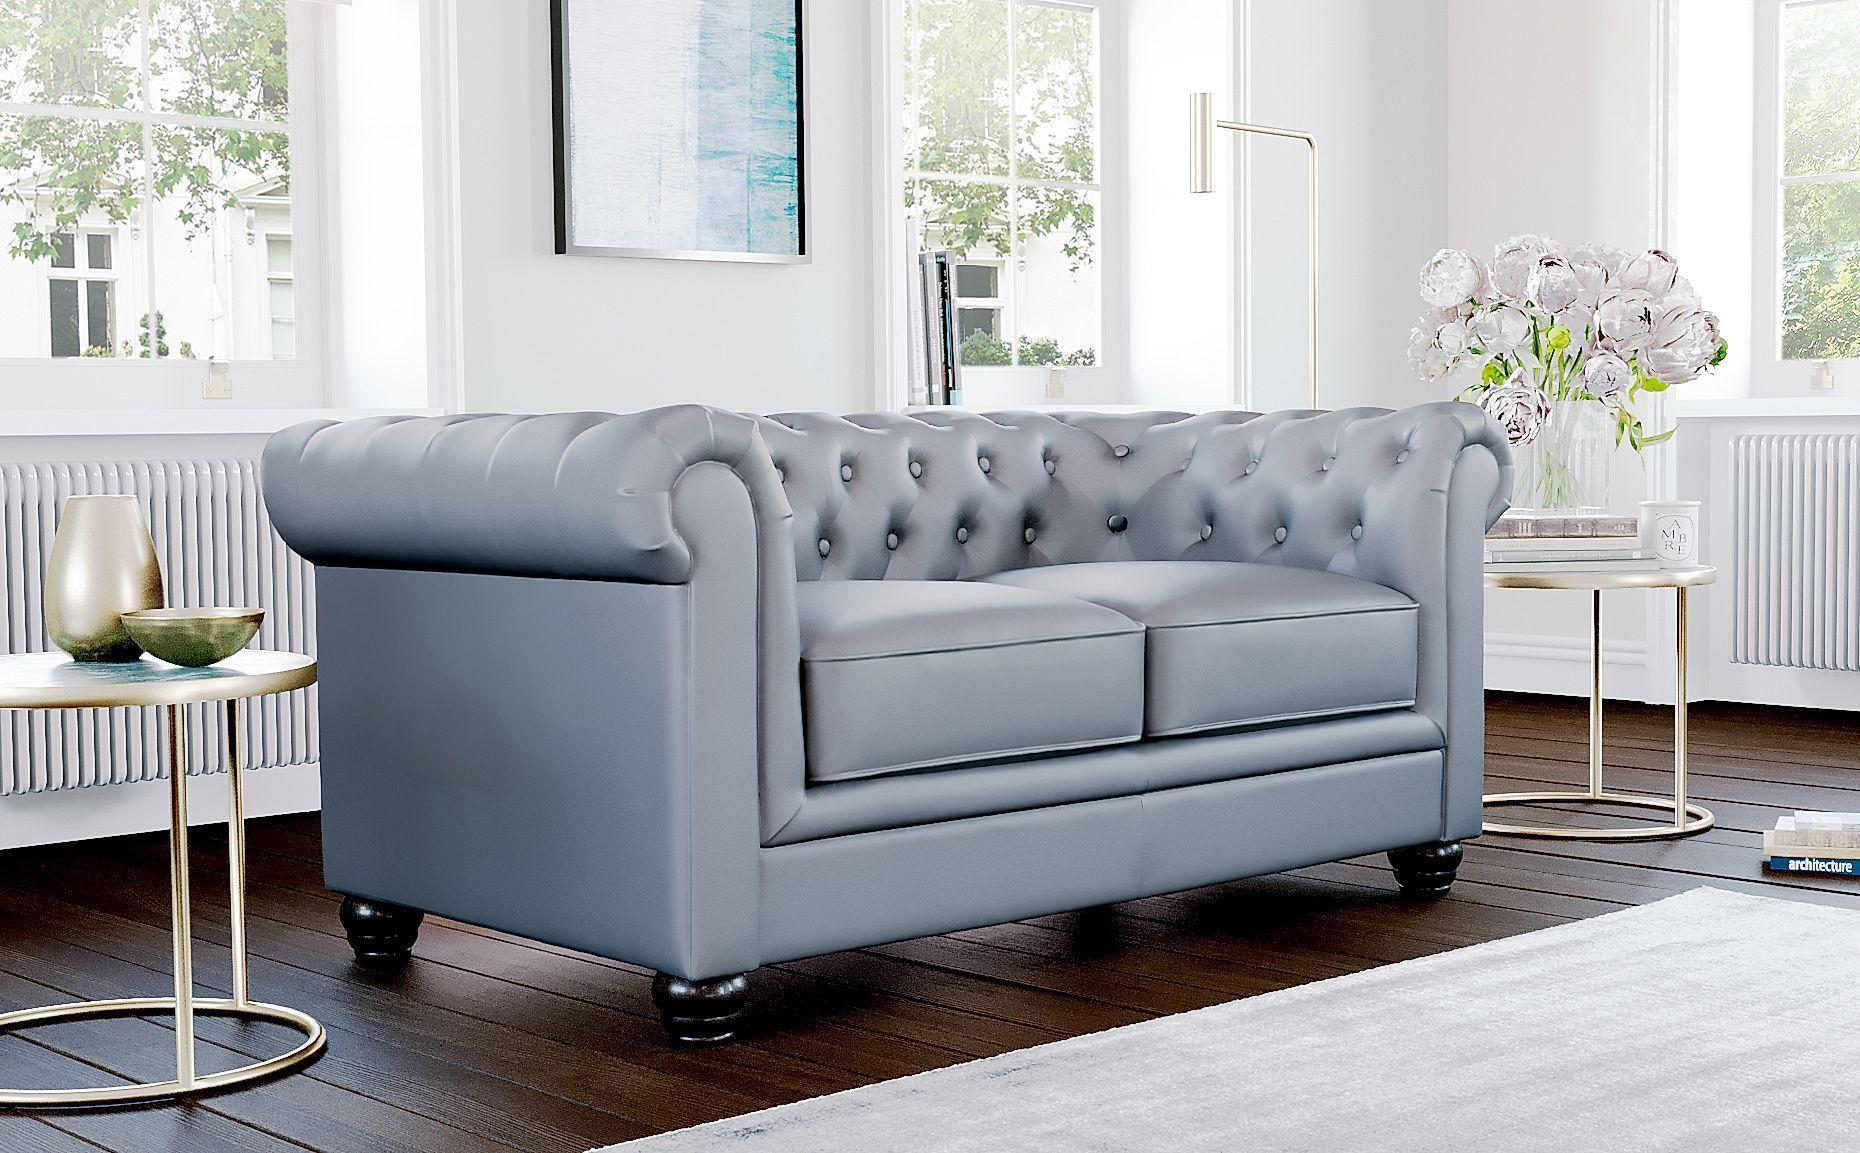 Hampton Grey Leather 2 Seater Chesterfield Sofa In 2020 Furniture Choice Furniture Sofa Furniture